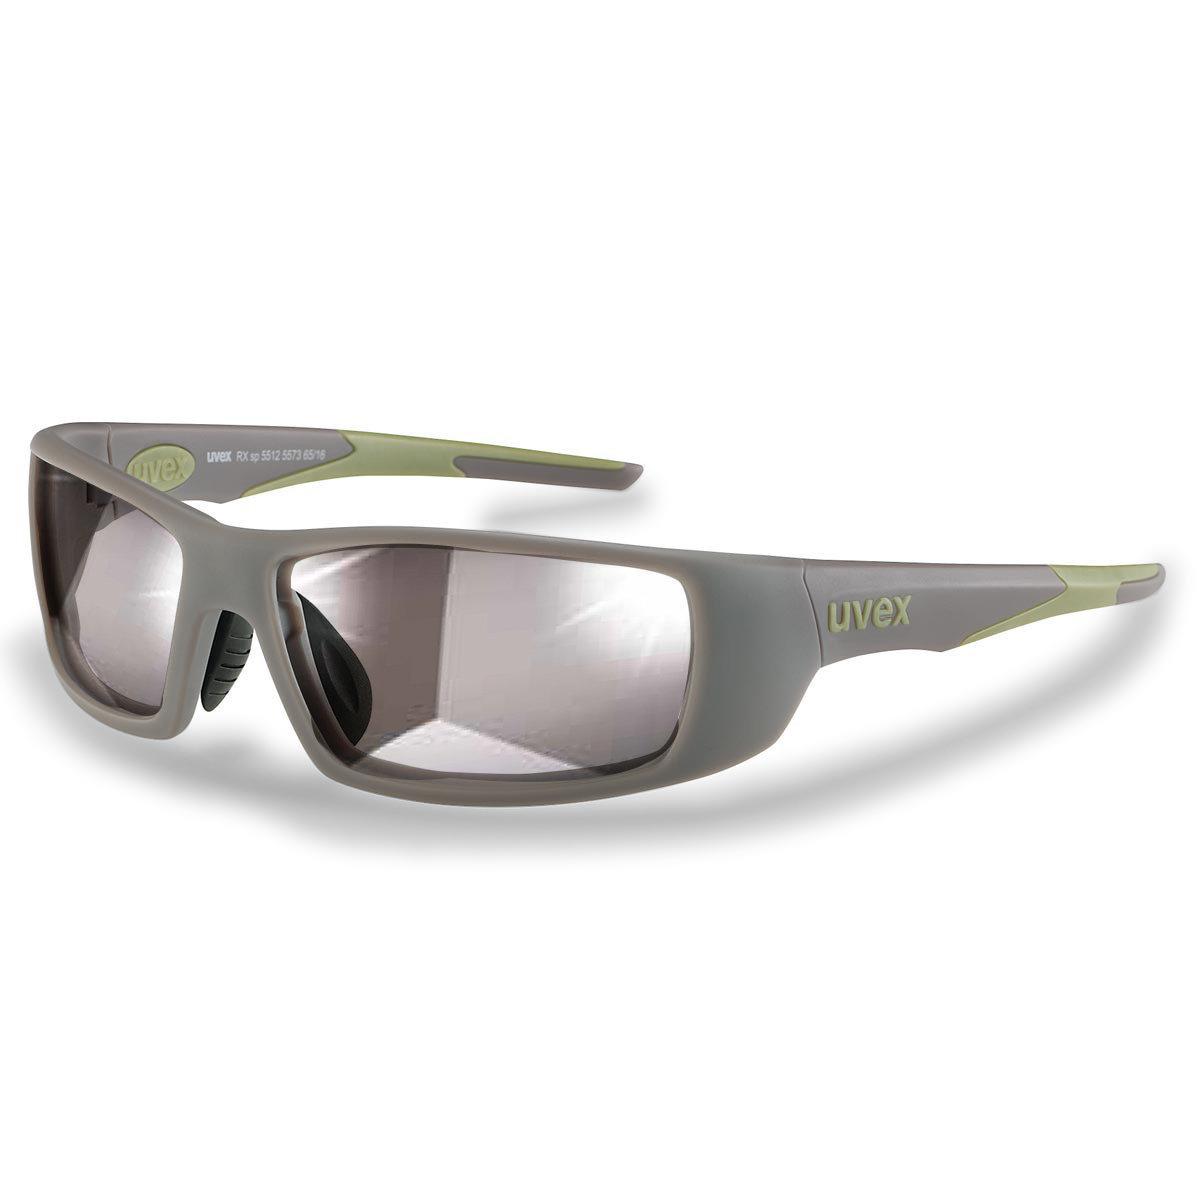 Carhartt bril diverse kleuren - Selbsttönend